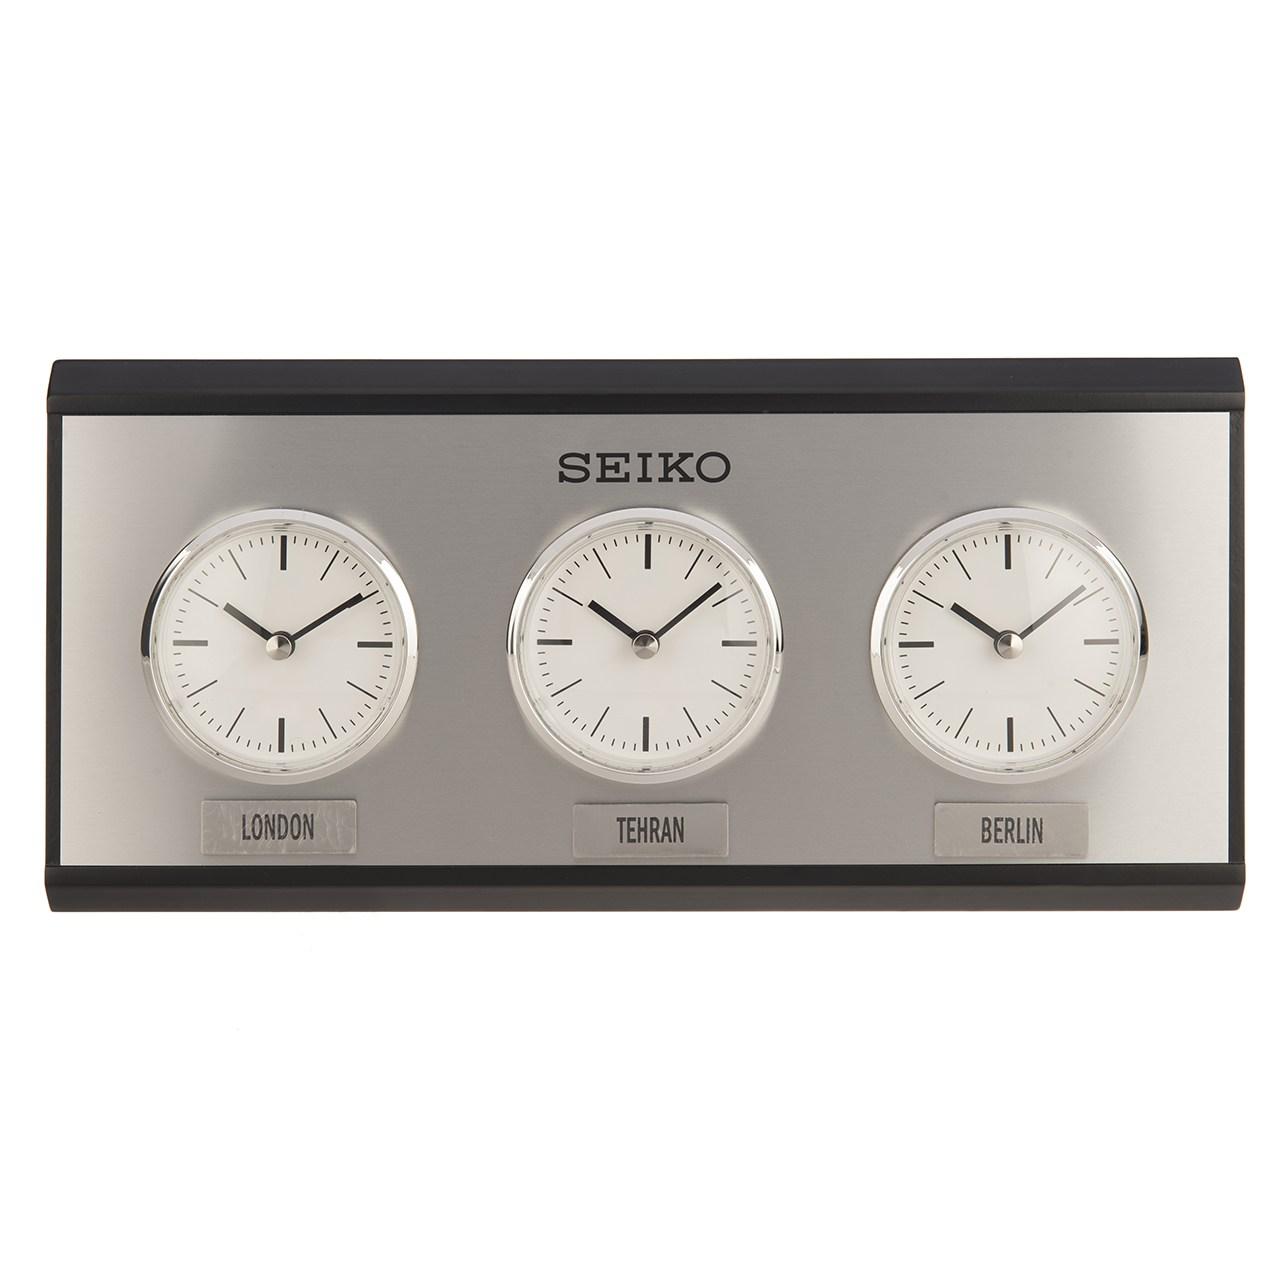 خرید ساعت رومیزی سیکو QXA623K | ساعت مچی